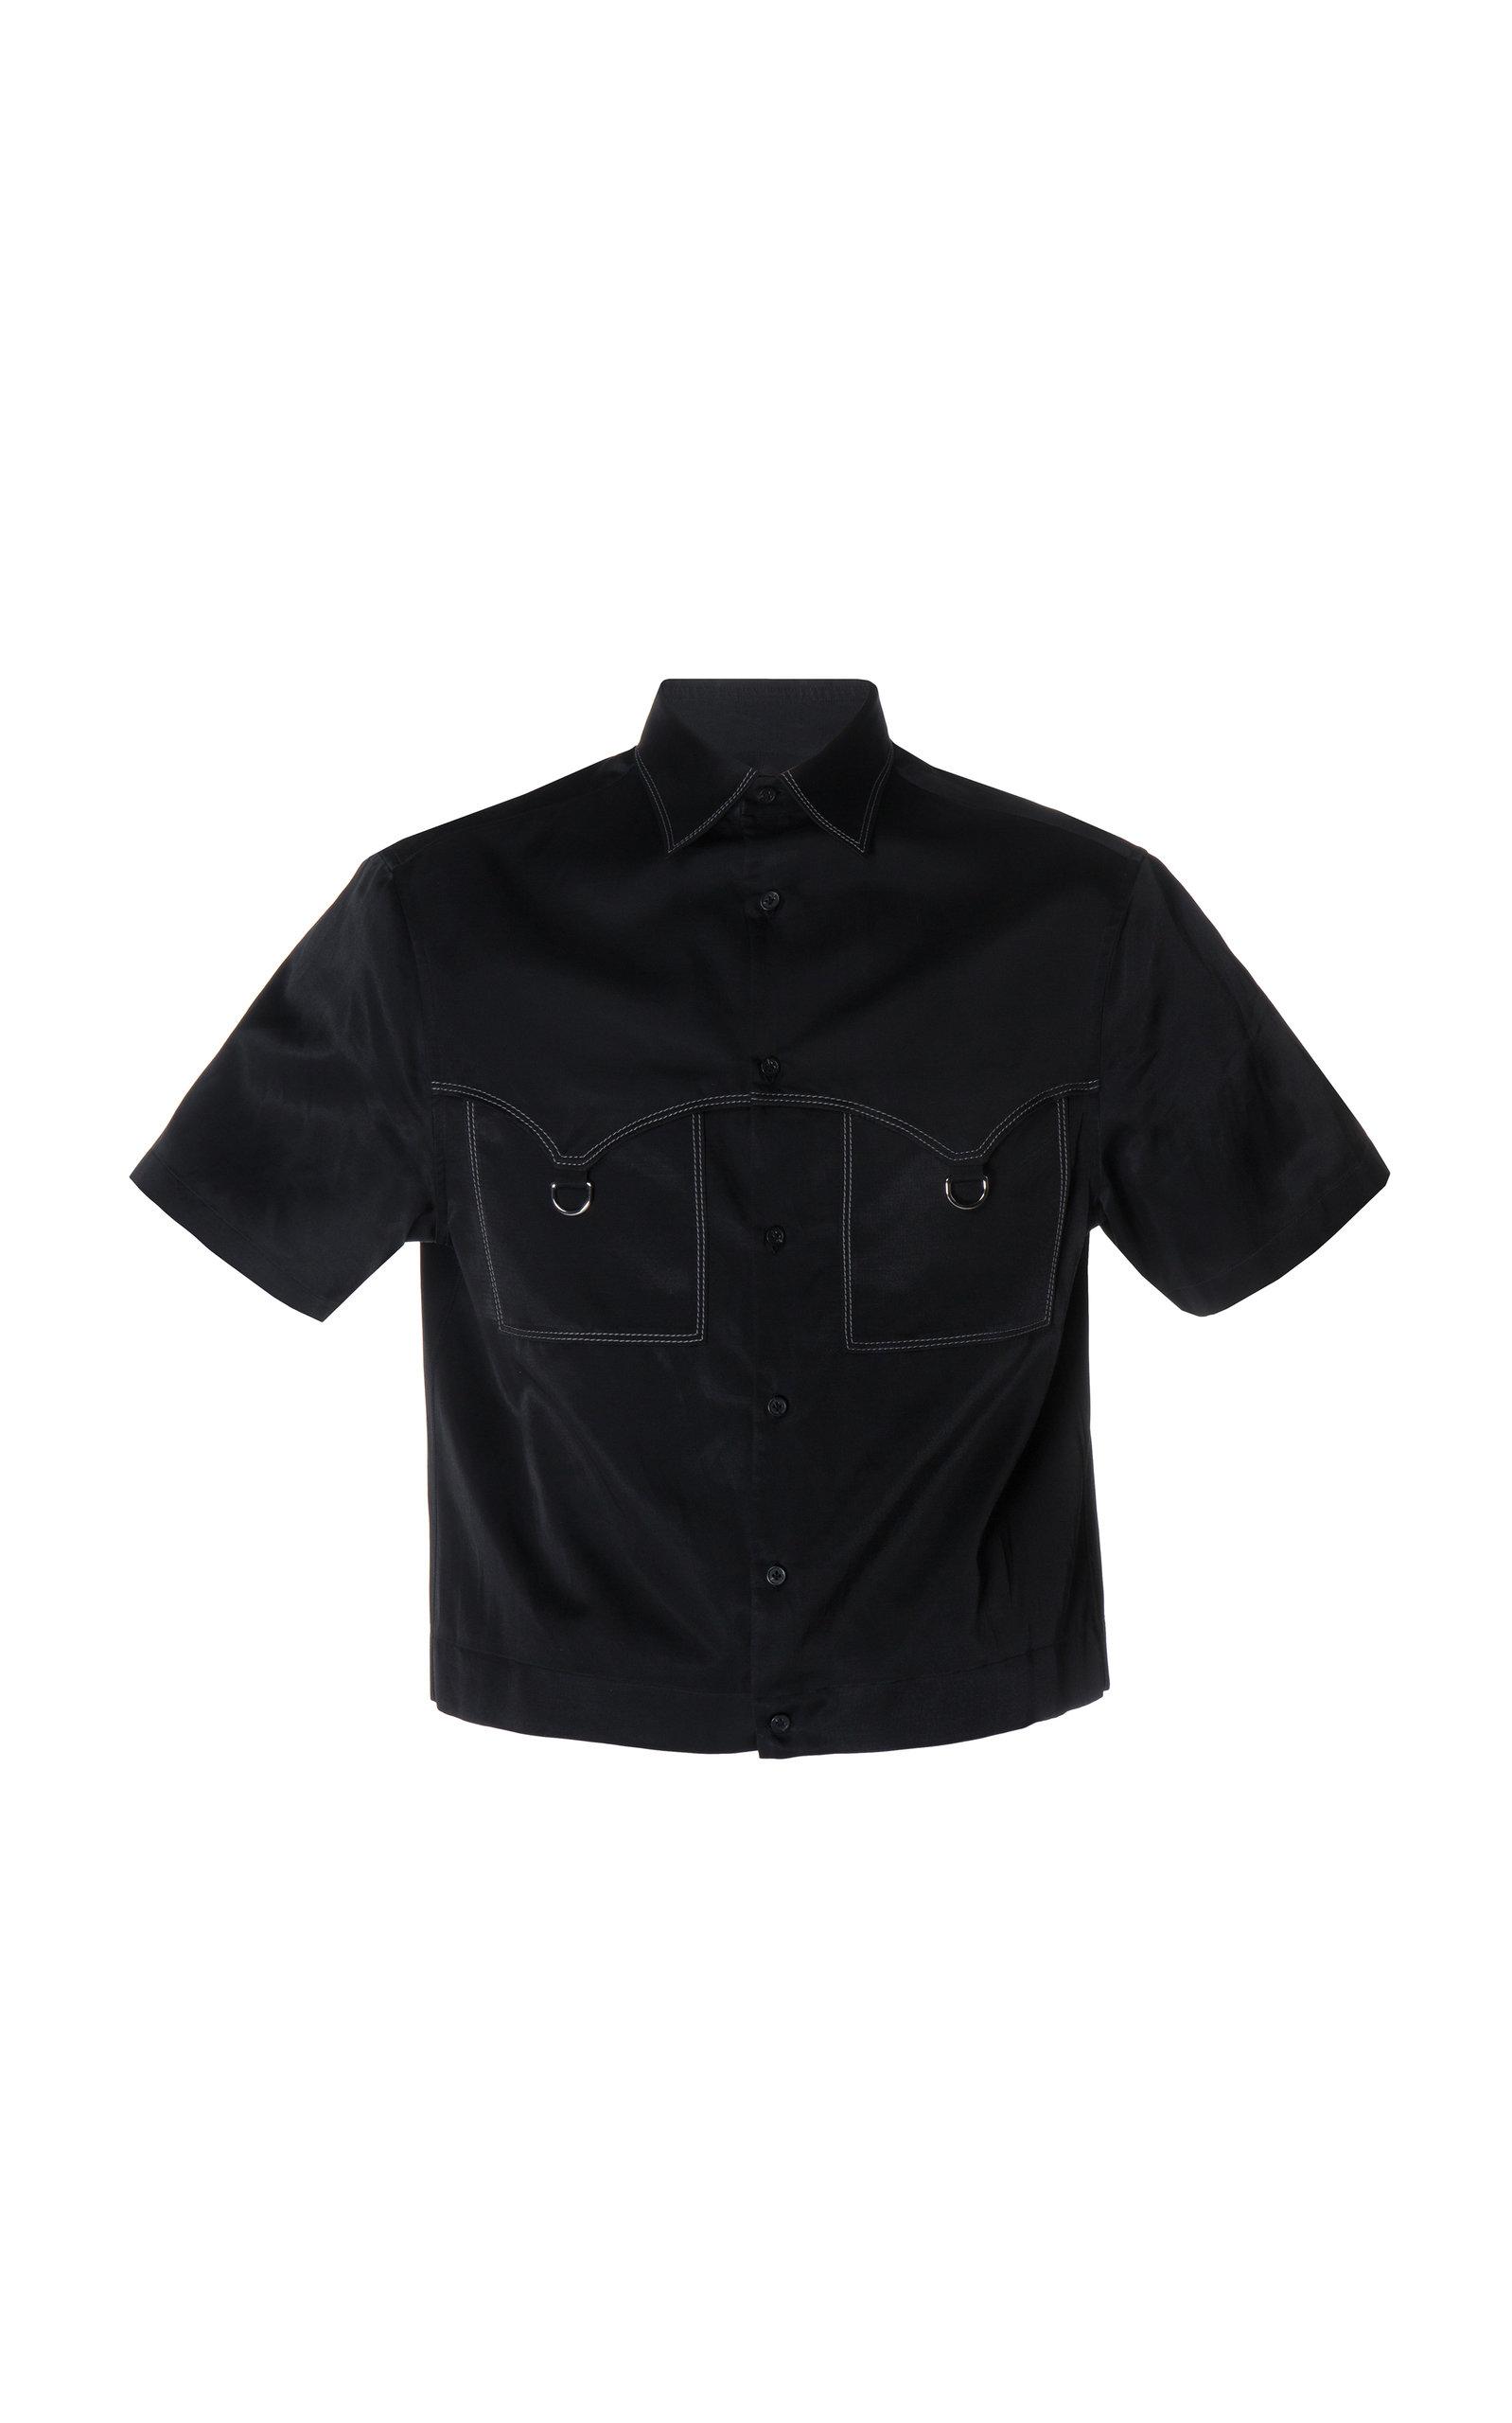 Lanvin Contrast Stitch Boxy Silk Shirt In Black